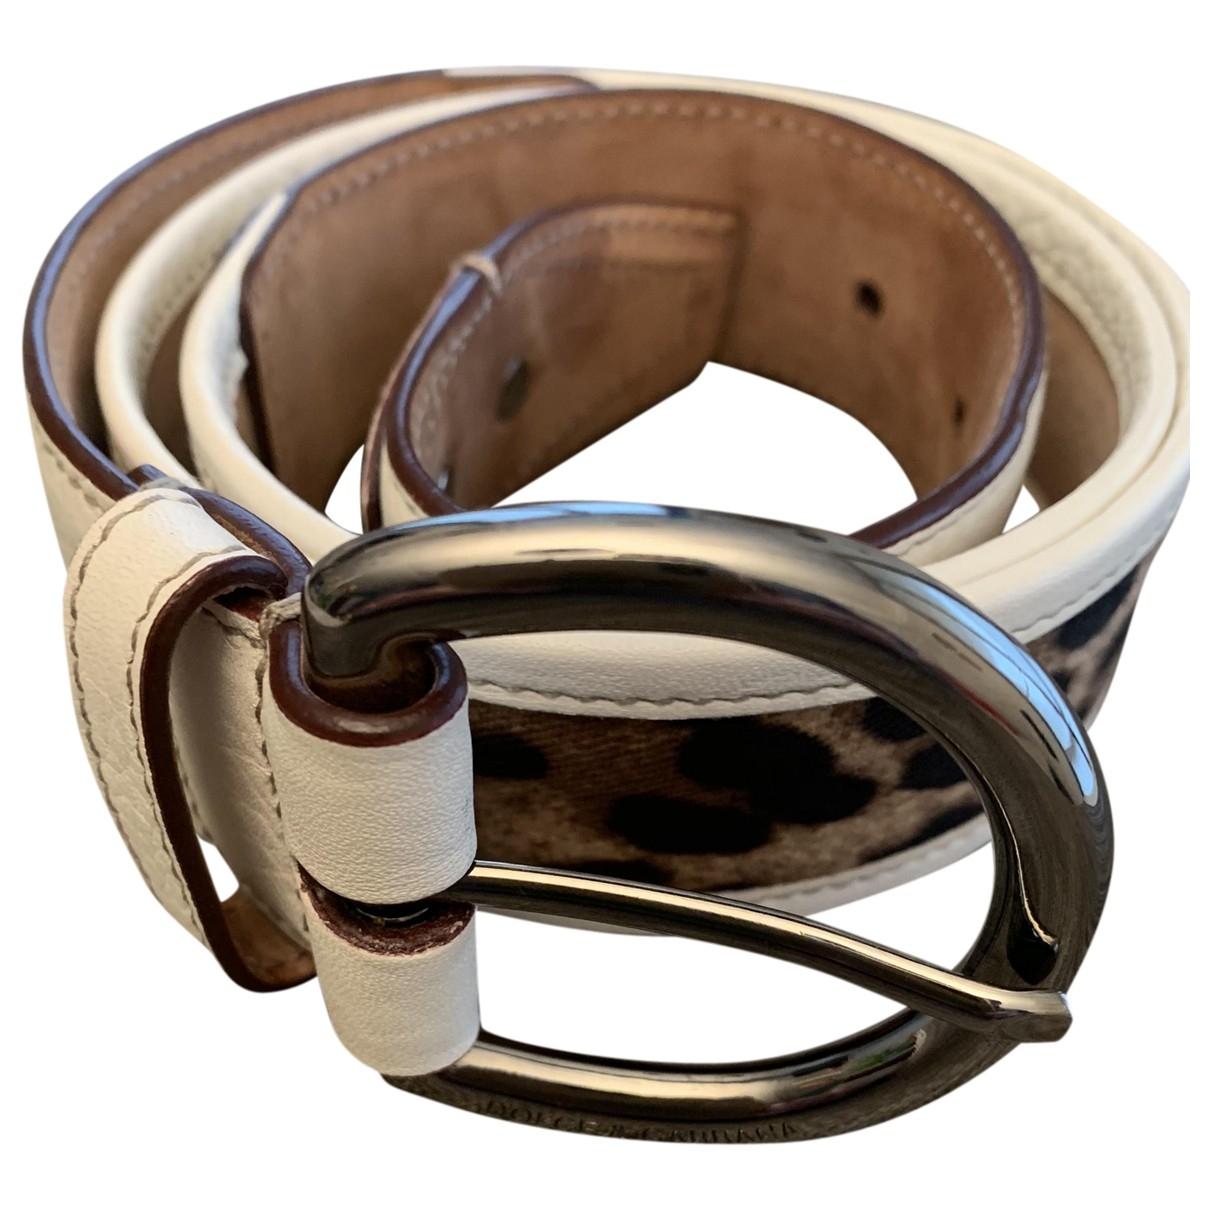 Dolce & Gabbana \N Leather belt for Women 85 cm